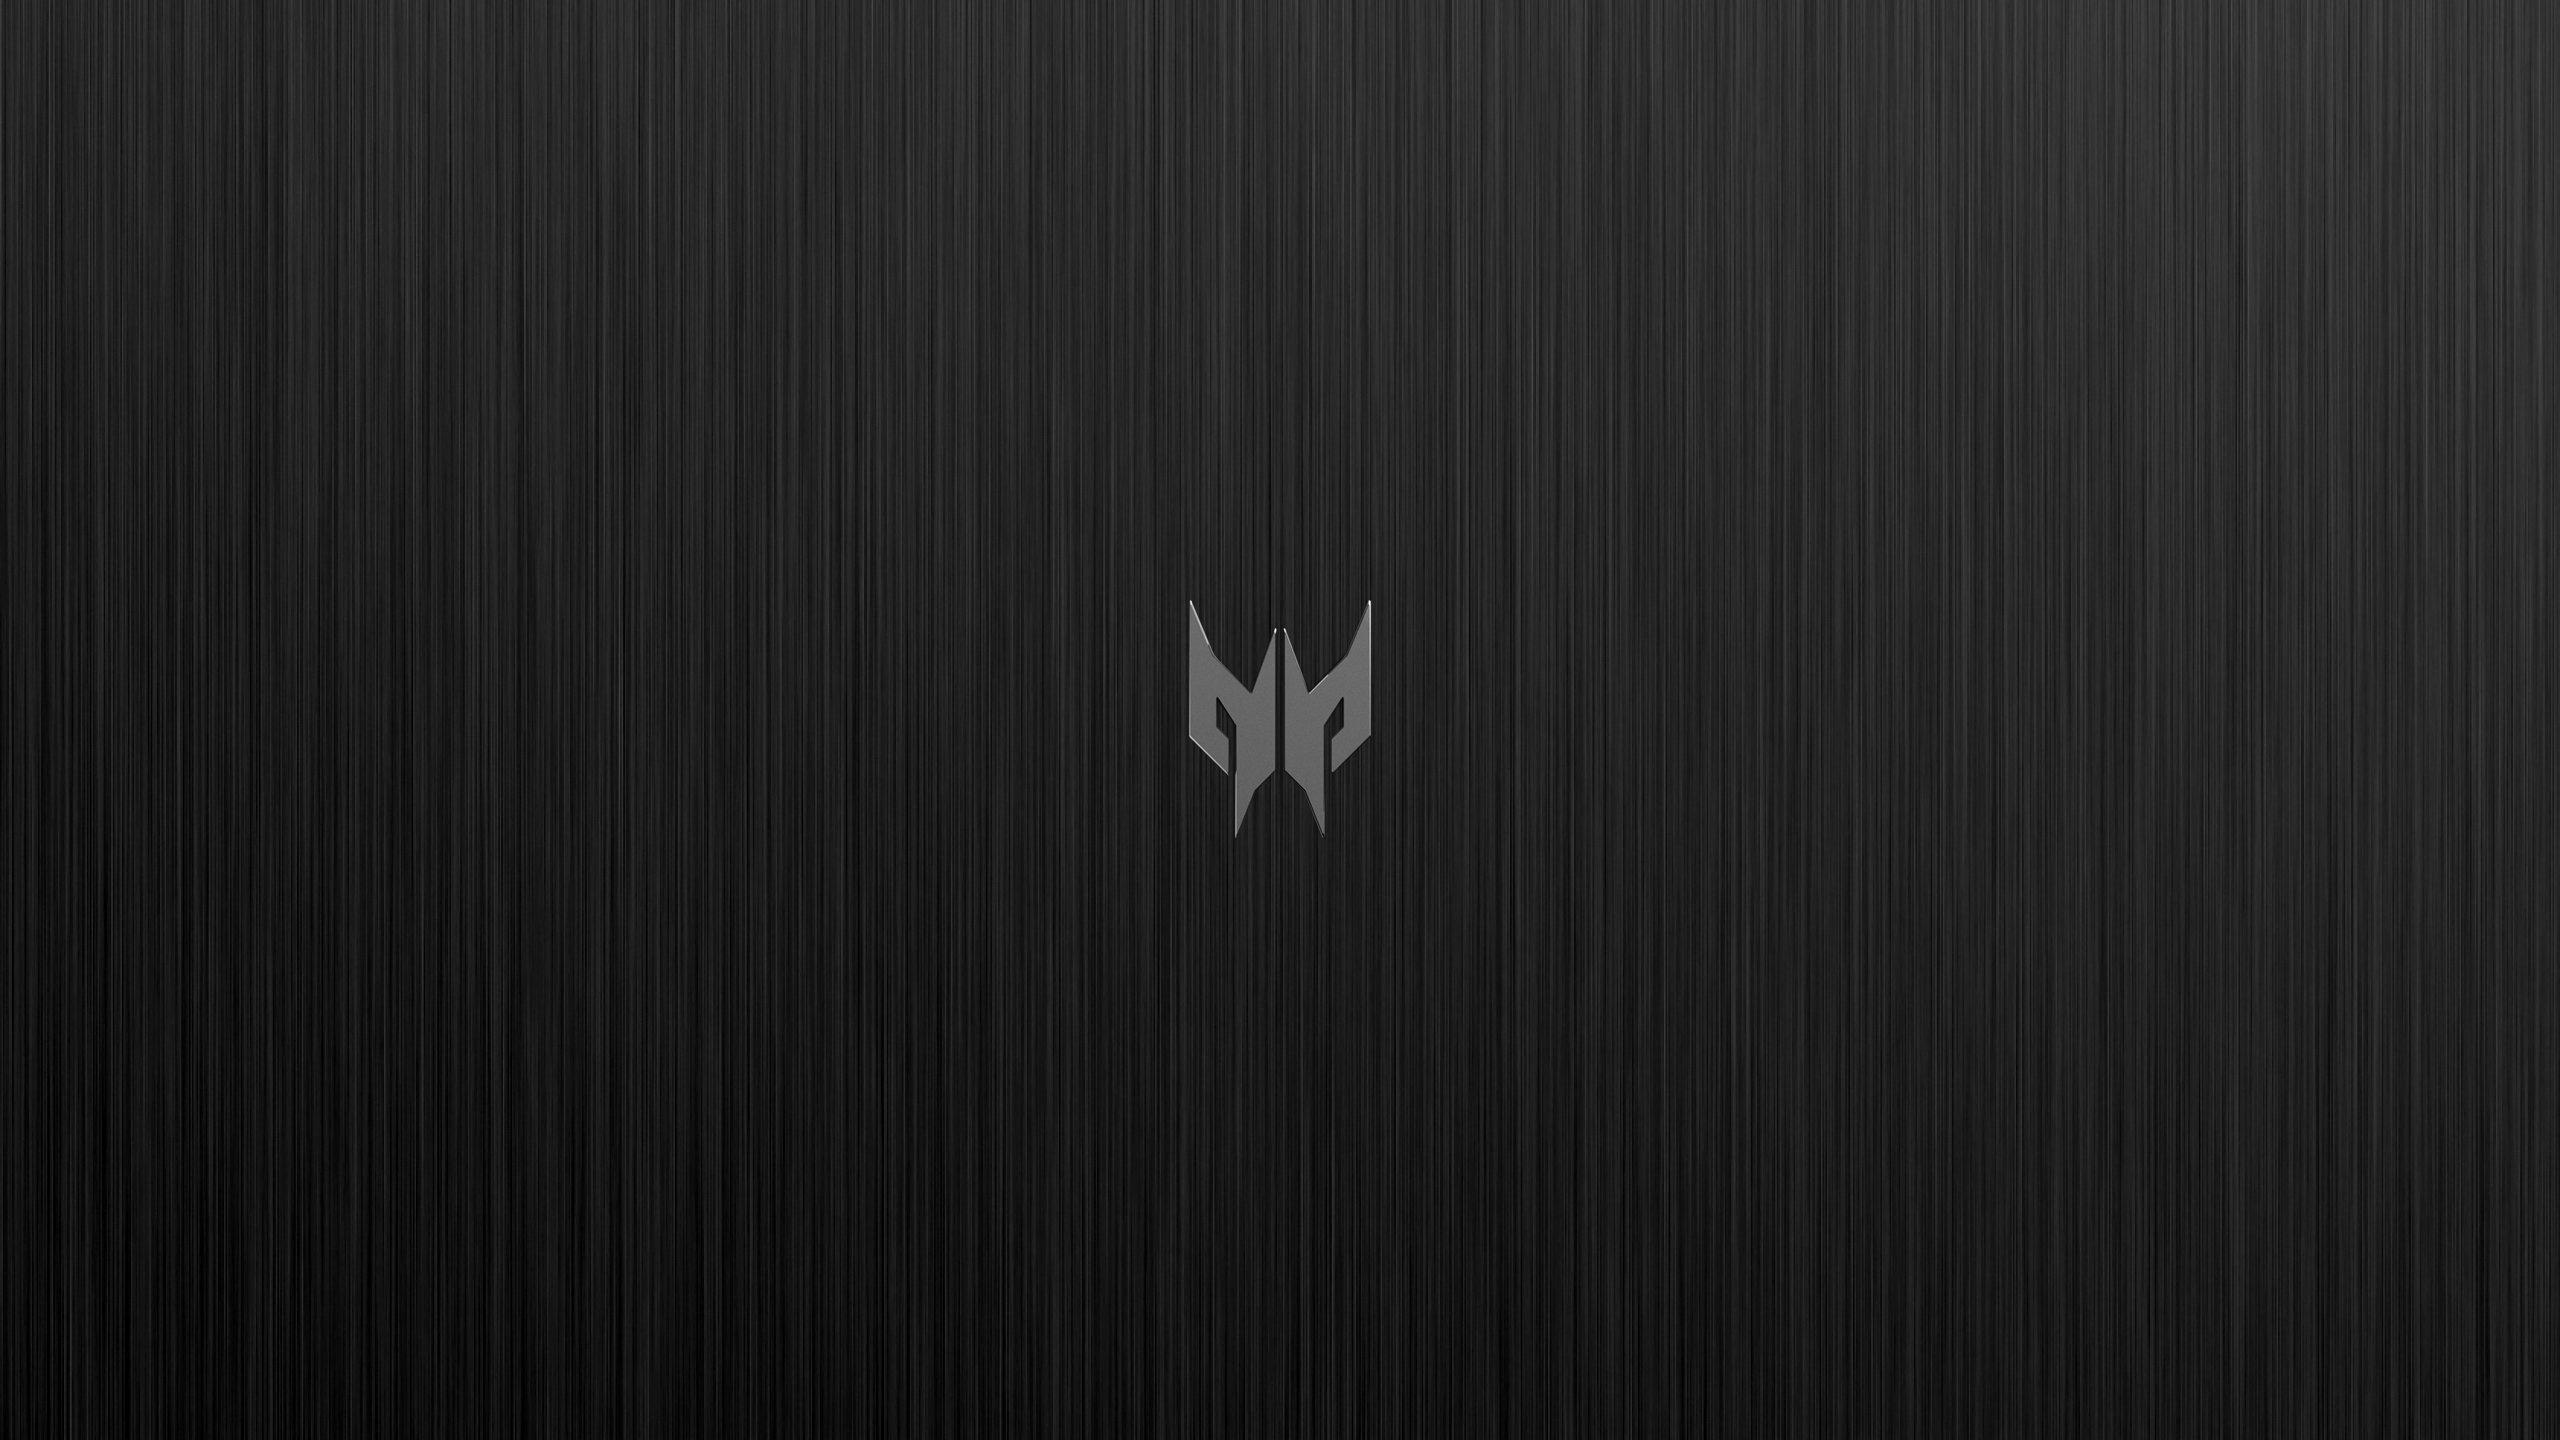 predator wallpapers 4k for your phone and desktop screen